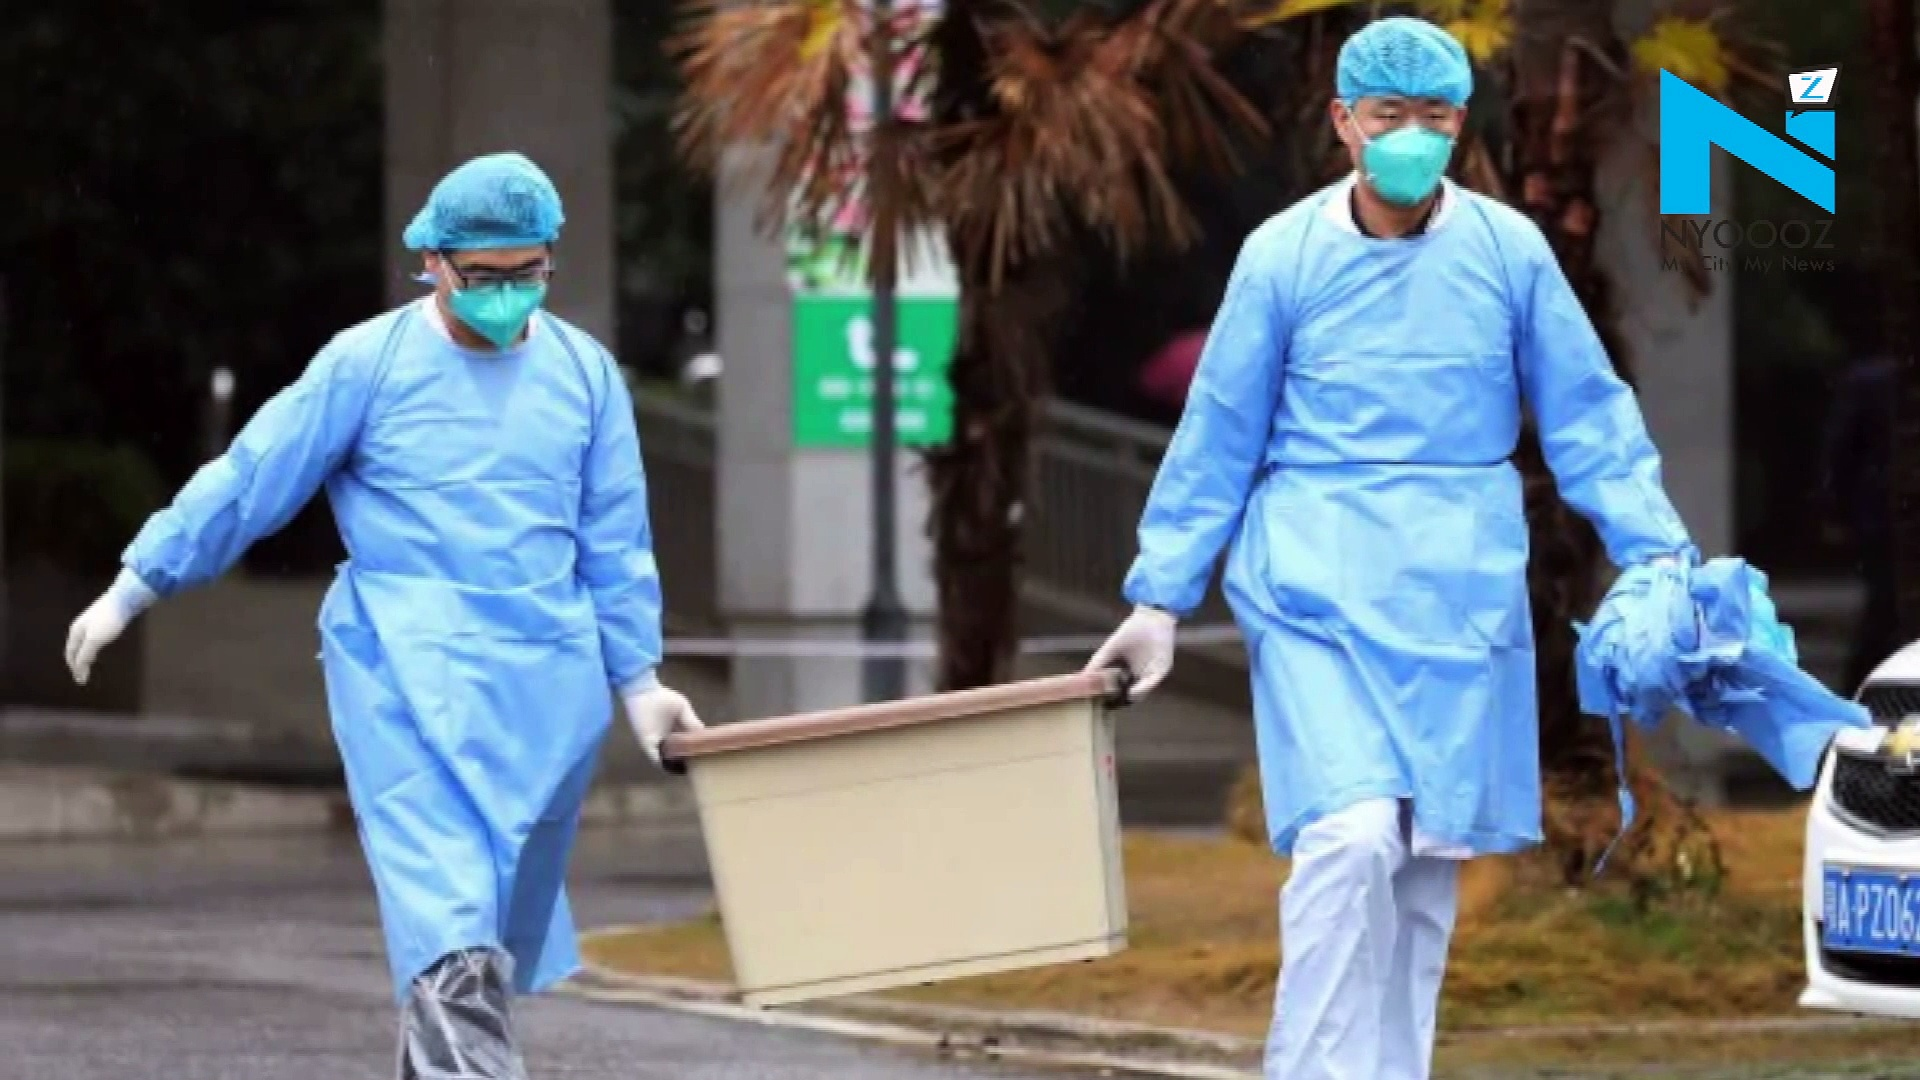 China coronavirus outbreak: All the latest updates